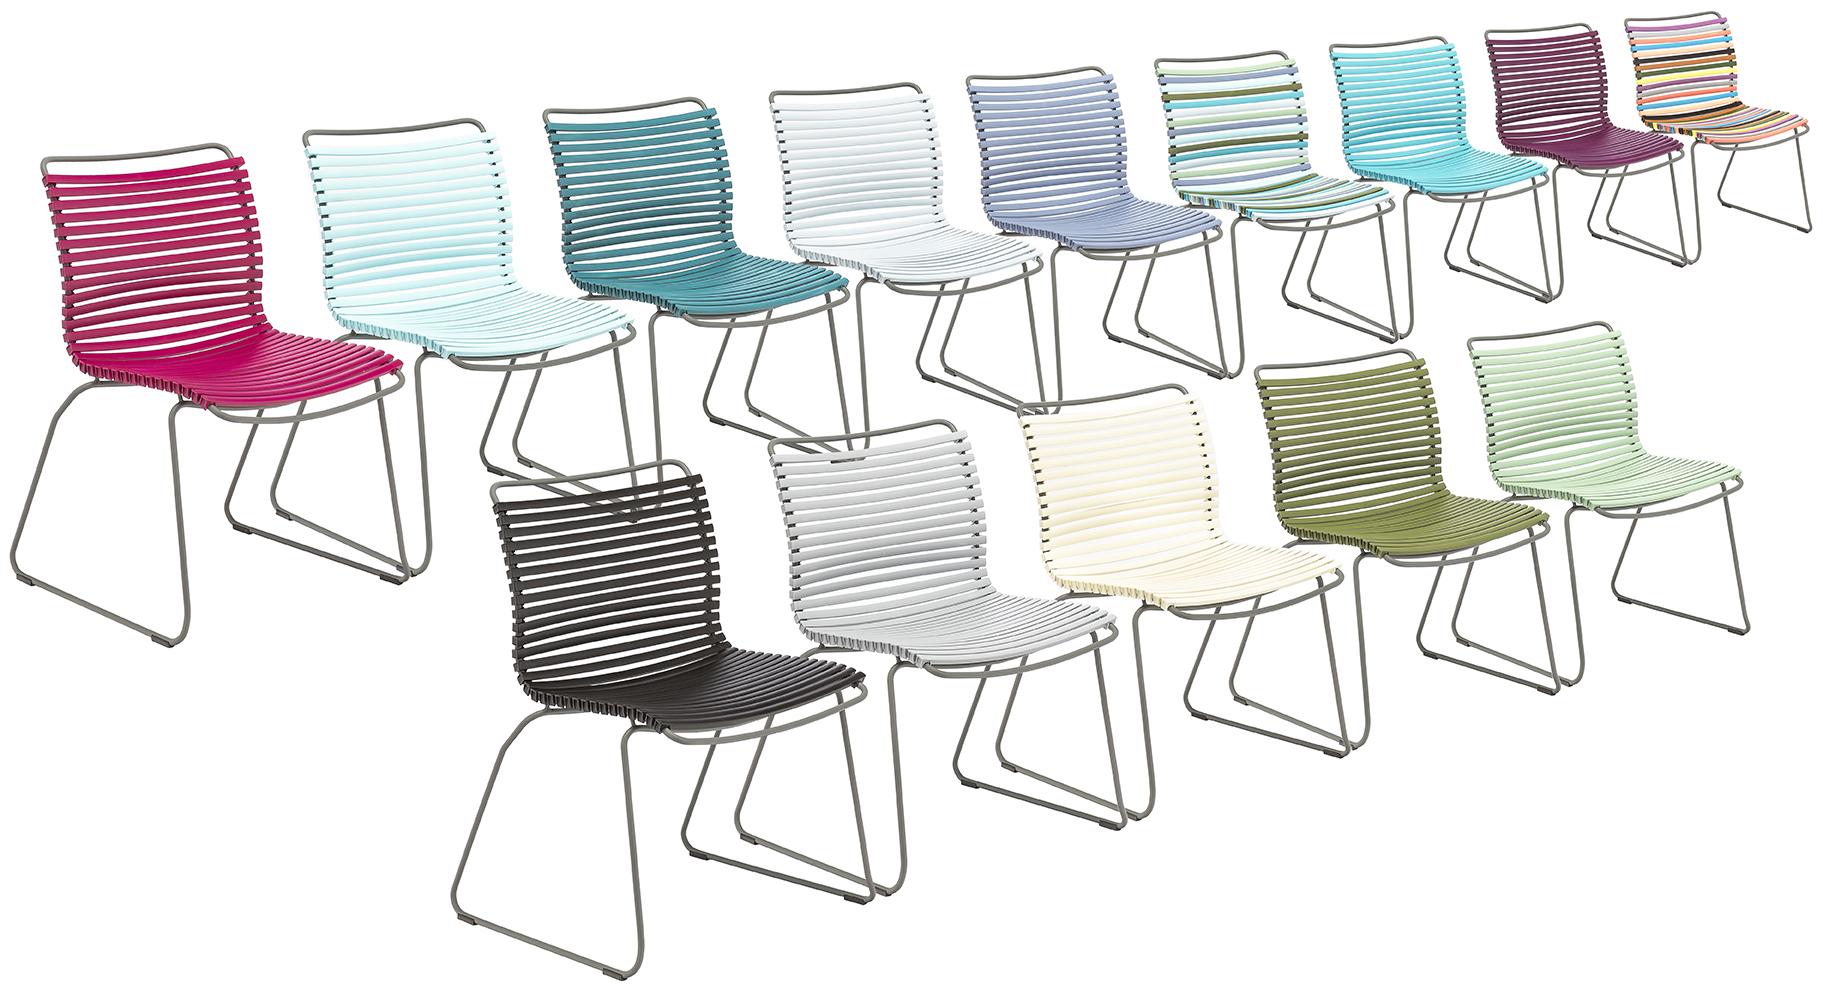 Click Stühle in allen Farben